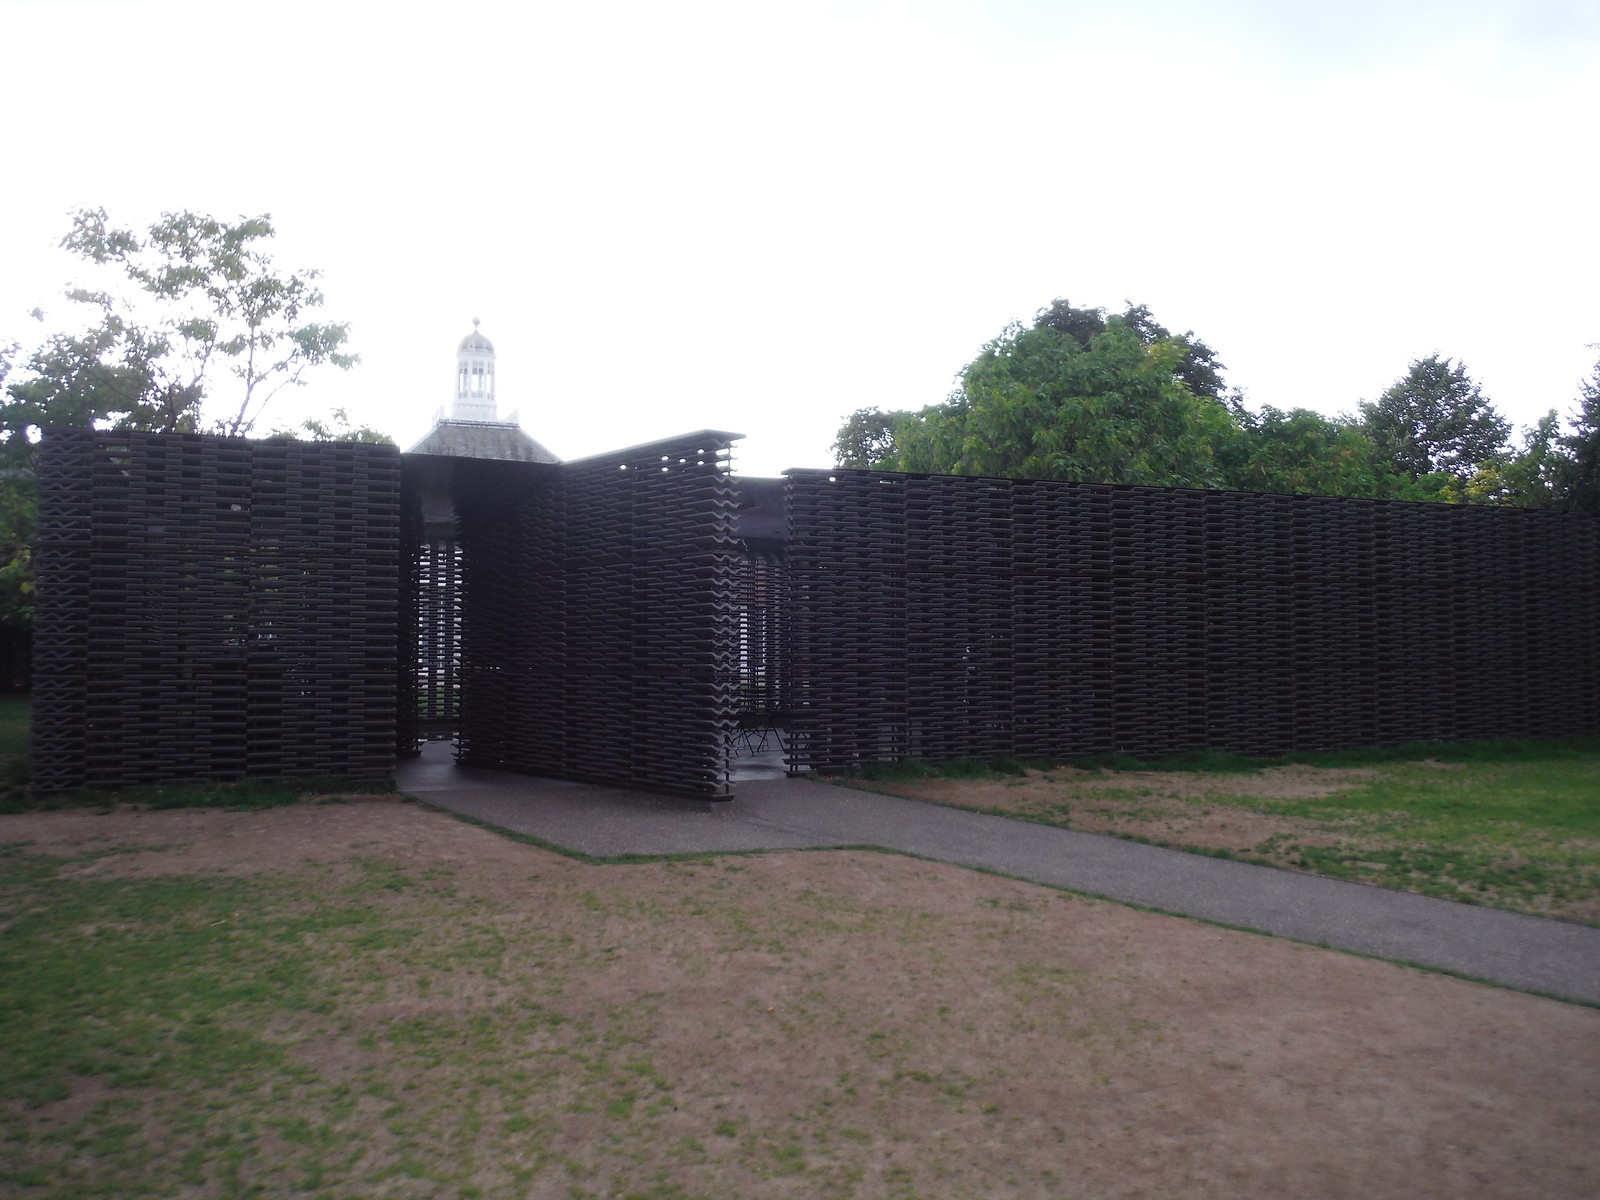 Serpentine Summer Pavilion 2018, by Frida Escobedo SWC Short Walk 19 - Royal Parks